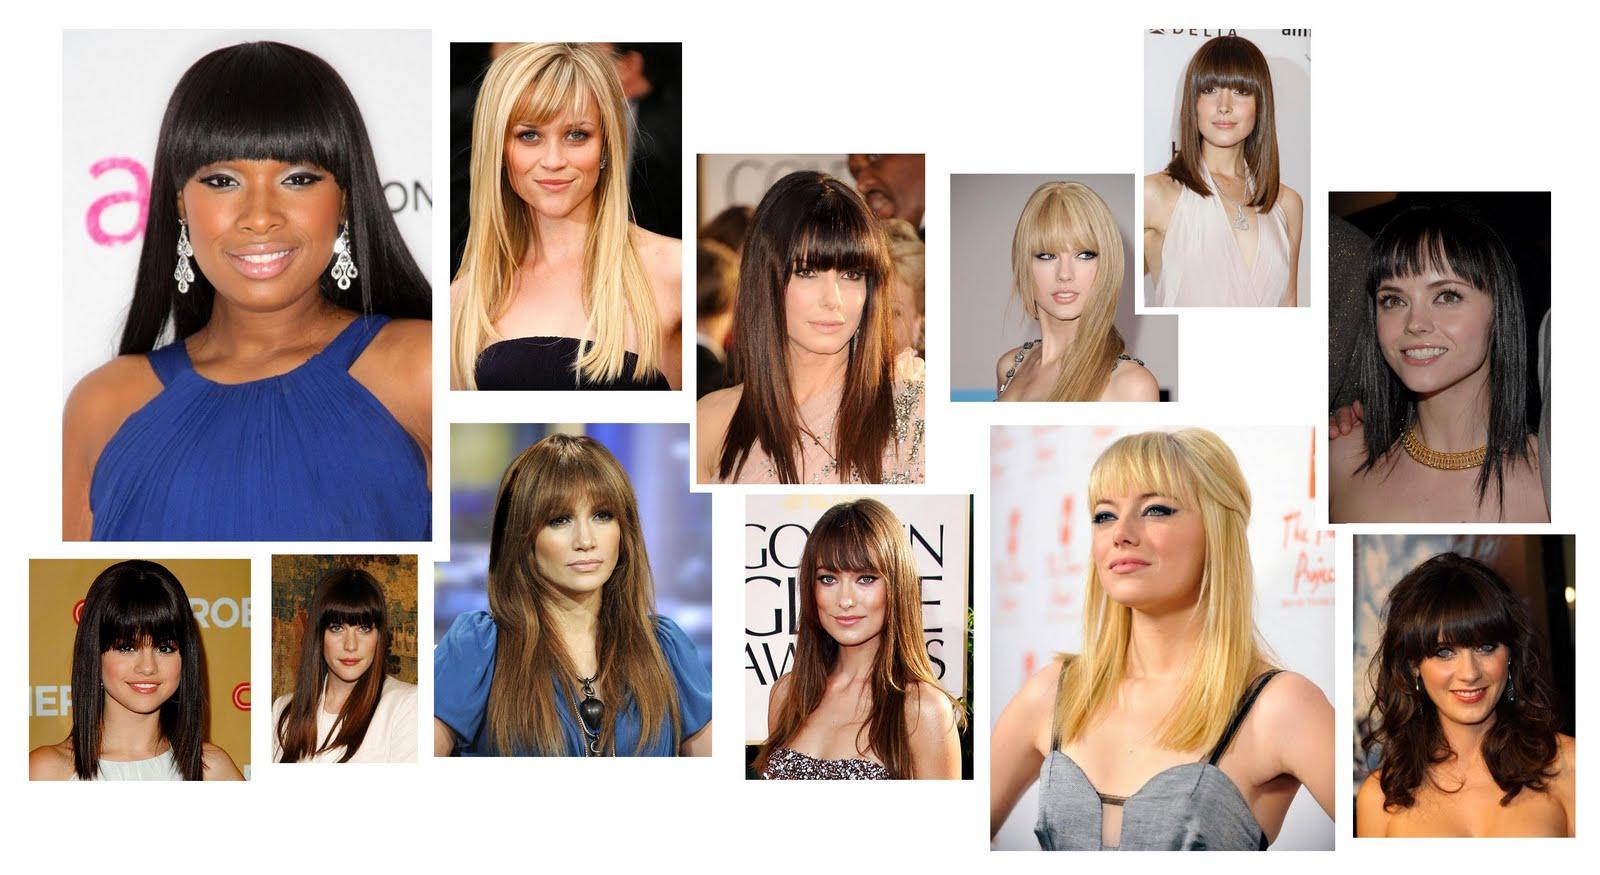 http://4.bp.blogspot.com/-OZkvlKwSAKA/TkvcfpHfFMI/AAAAAAAABpM/DCc240ftnfA/s1600/celebrity+fringe+bangs.jpg